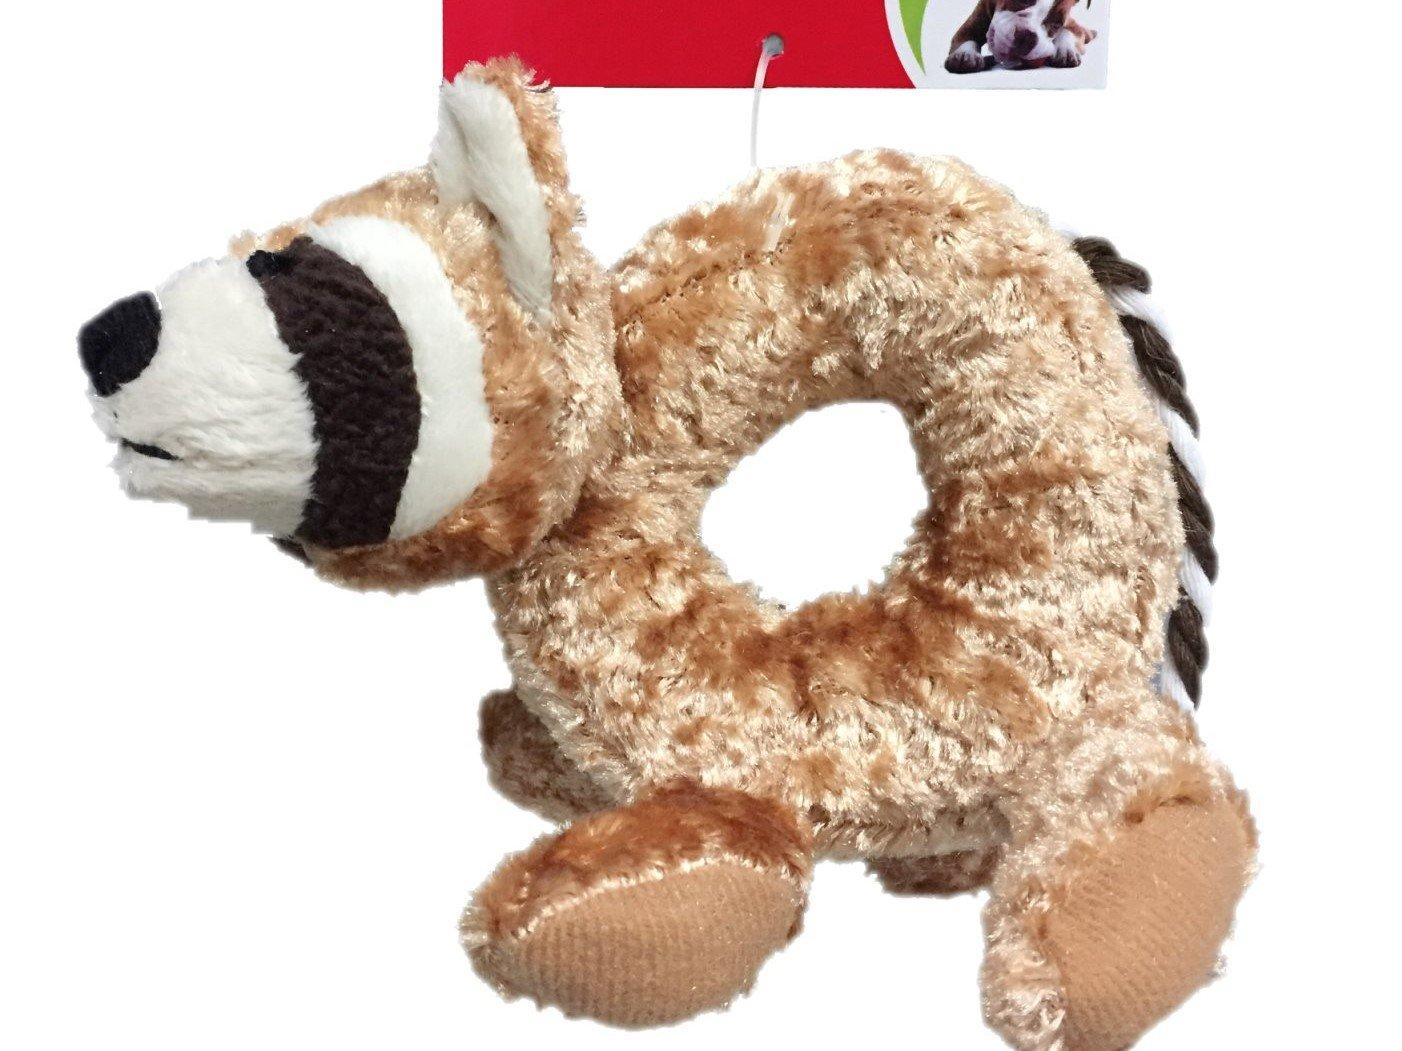 Dogman plyschdjur med pipljud